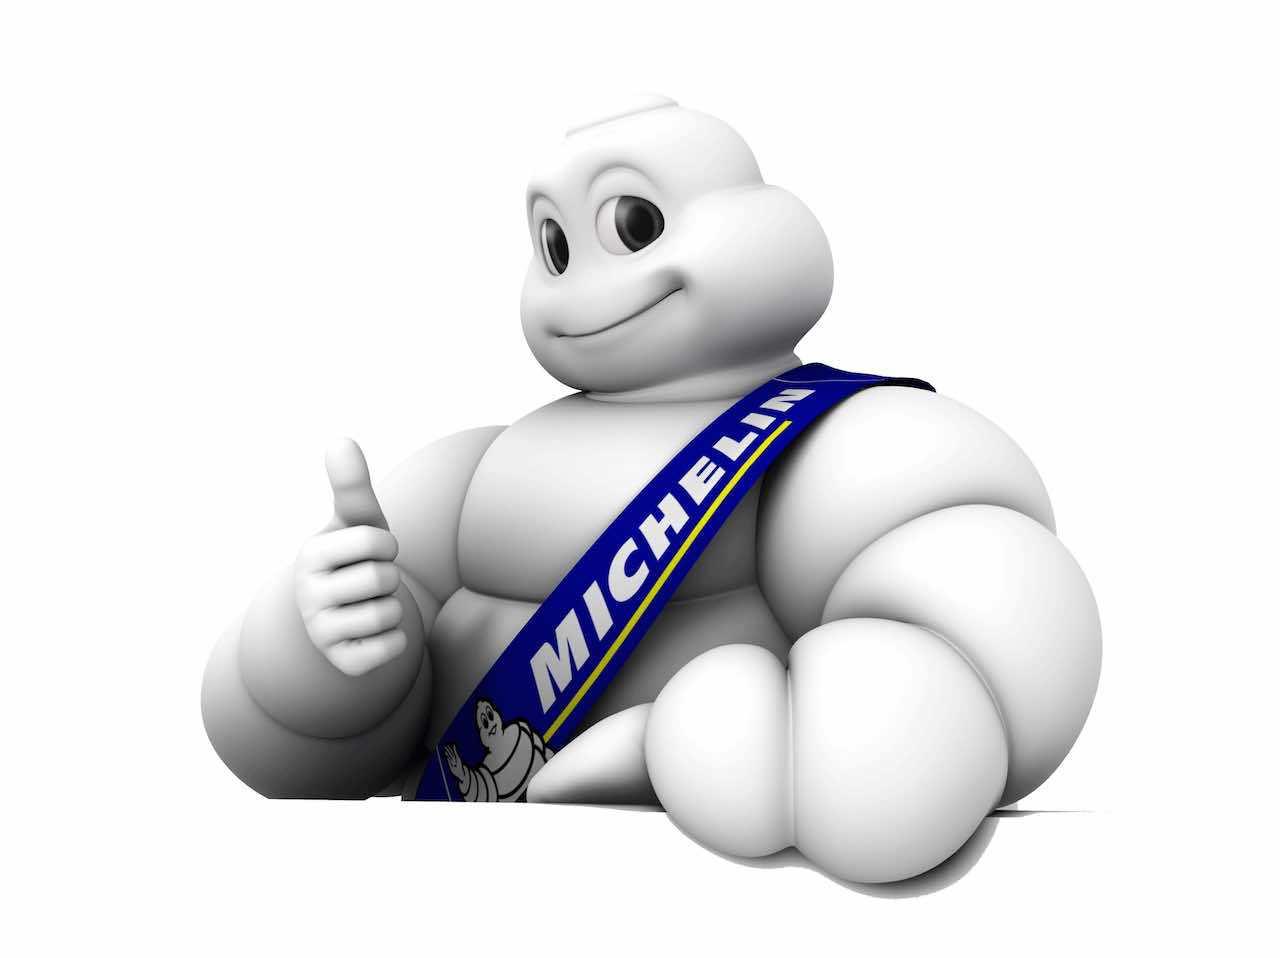 SWOT analysis of Michelin